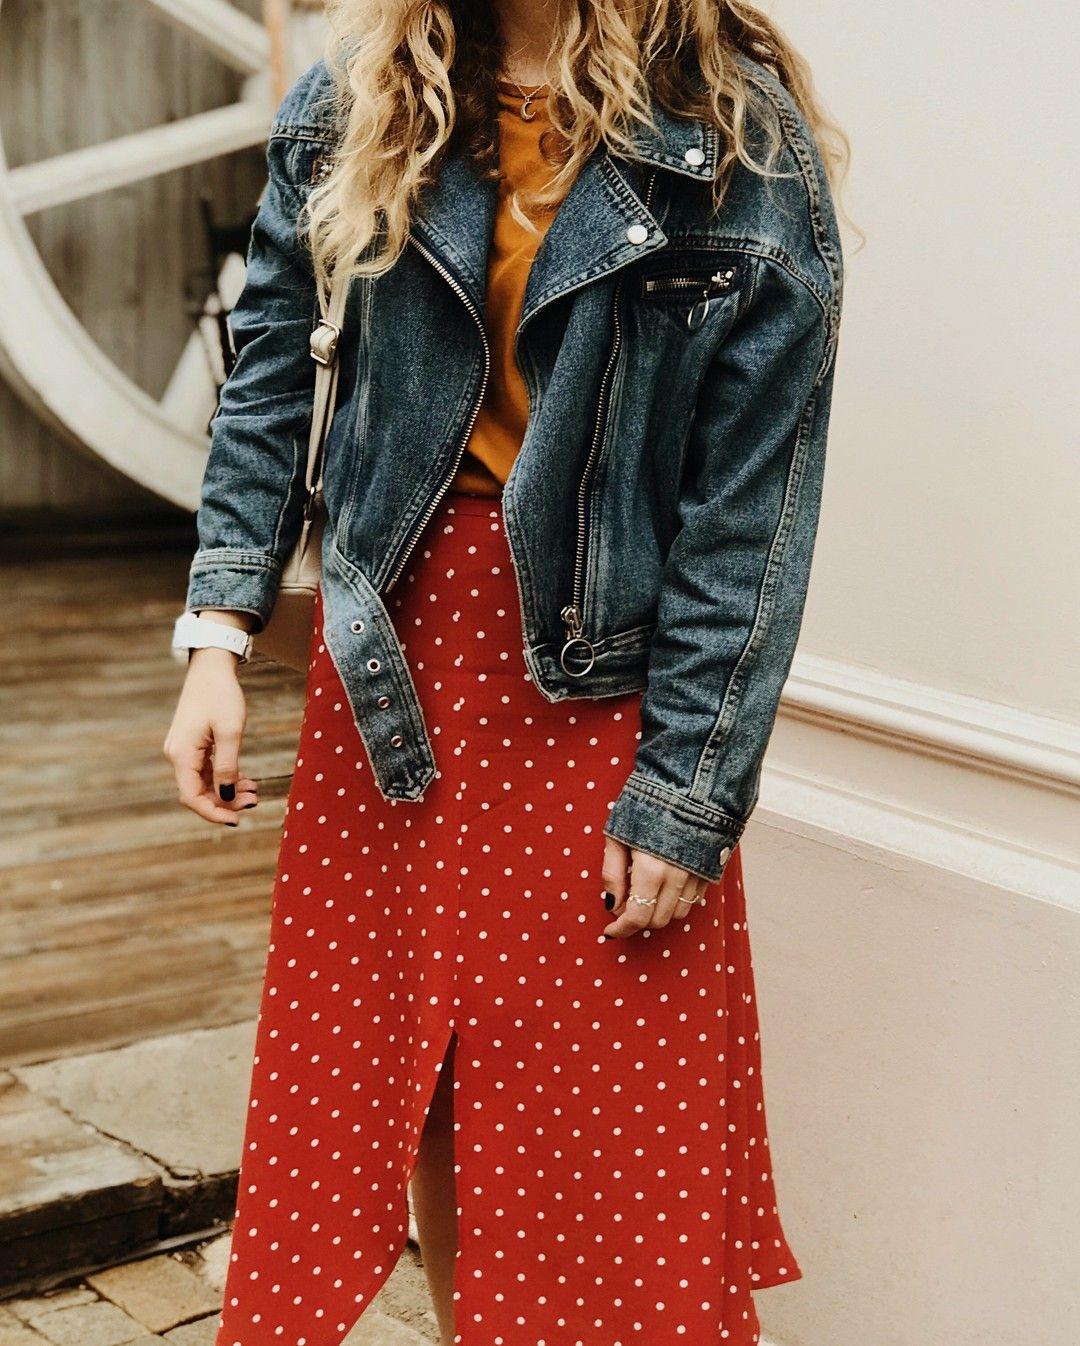 Pin by Bridget O'Keefe on fashion Fashion, Wardrobe, Pants